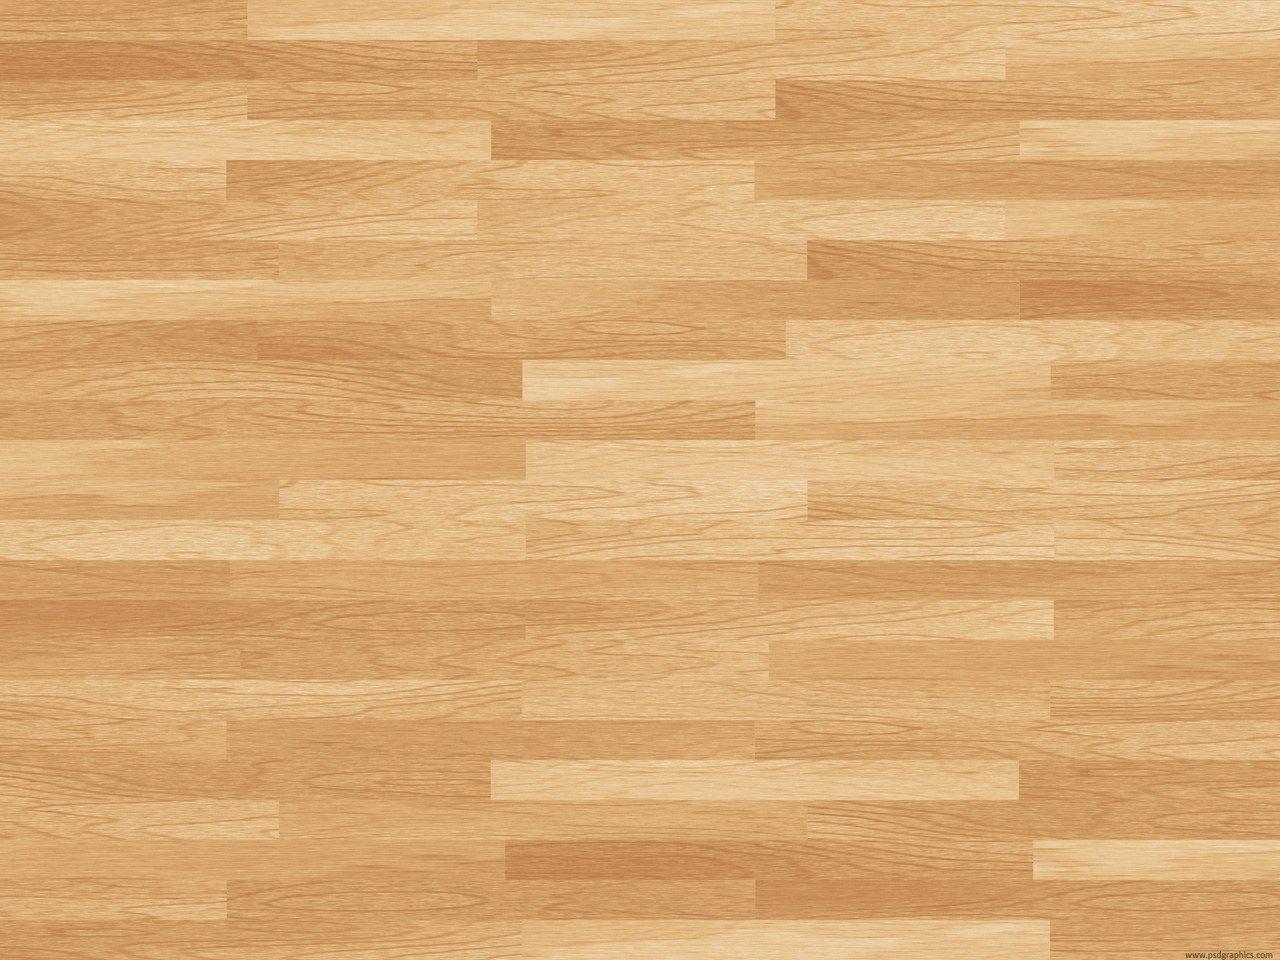 wood flooring clipart.